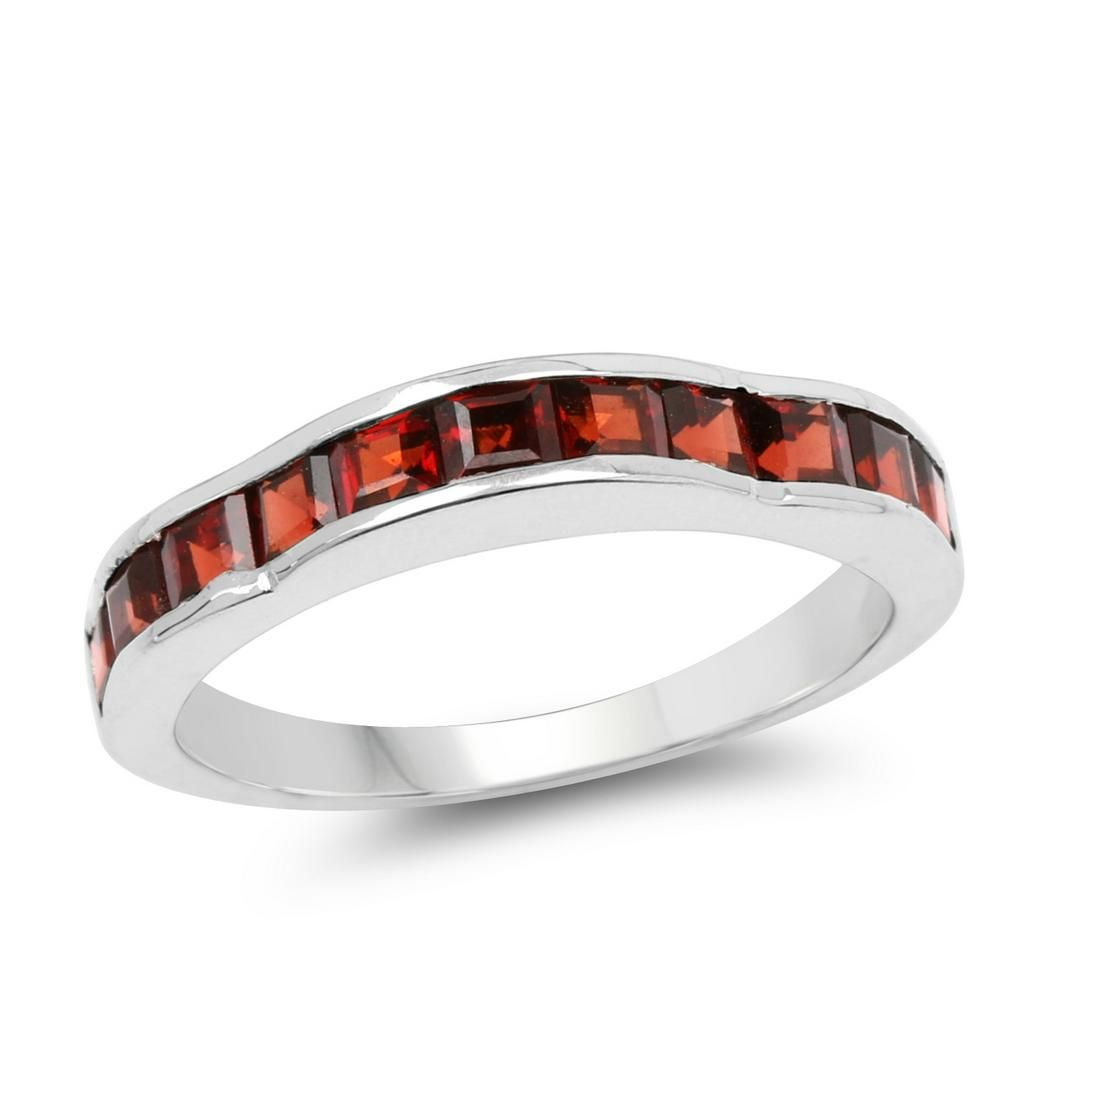 2.25 Carat Genuine Garnet .925 Sterling Silver Ring